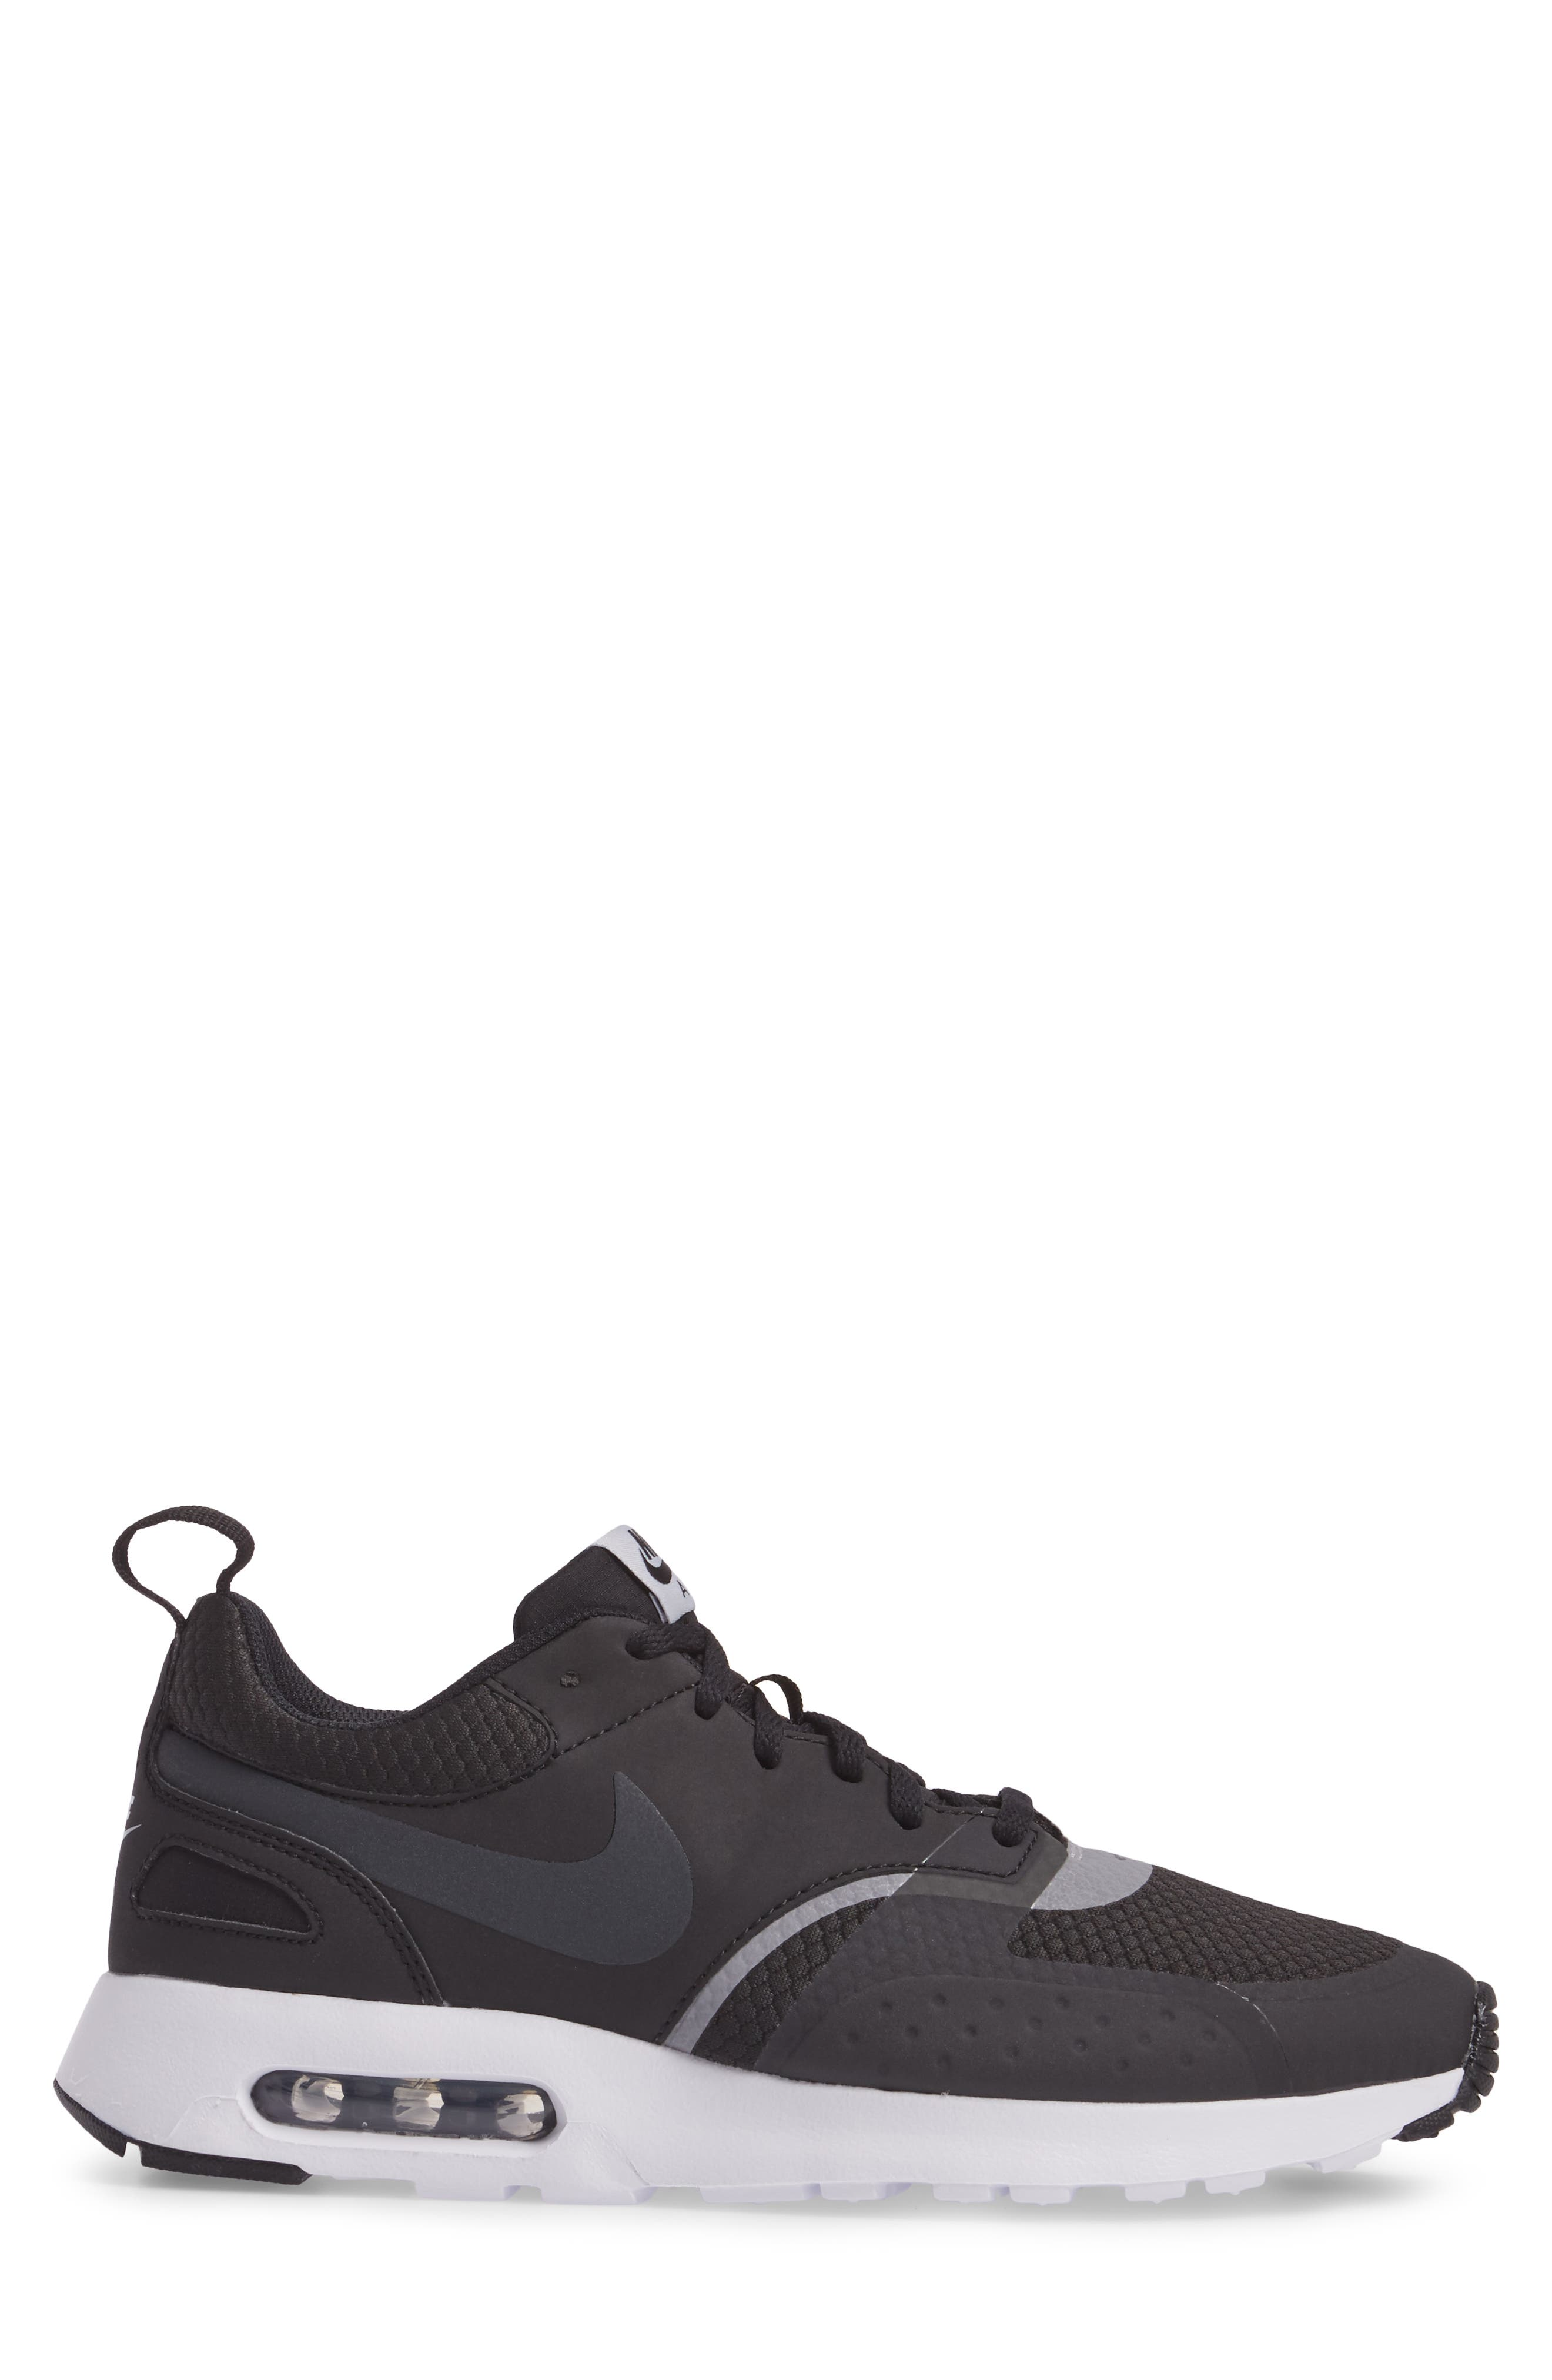 Air Max Vision SE Sneaker,                             Alternate thumbnail 3, color,                             006